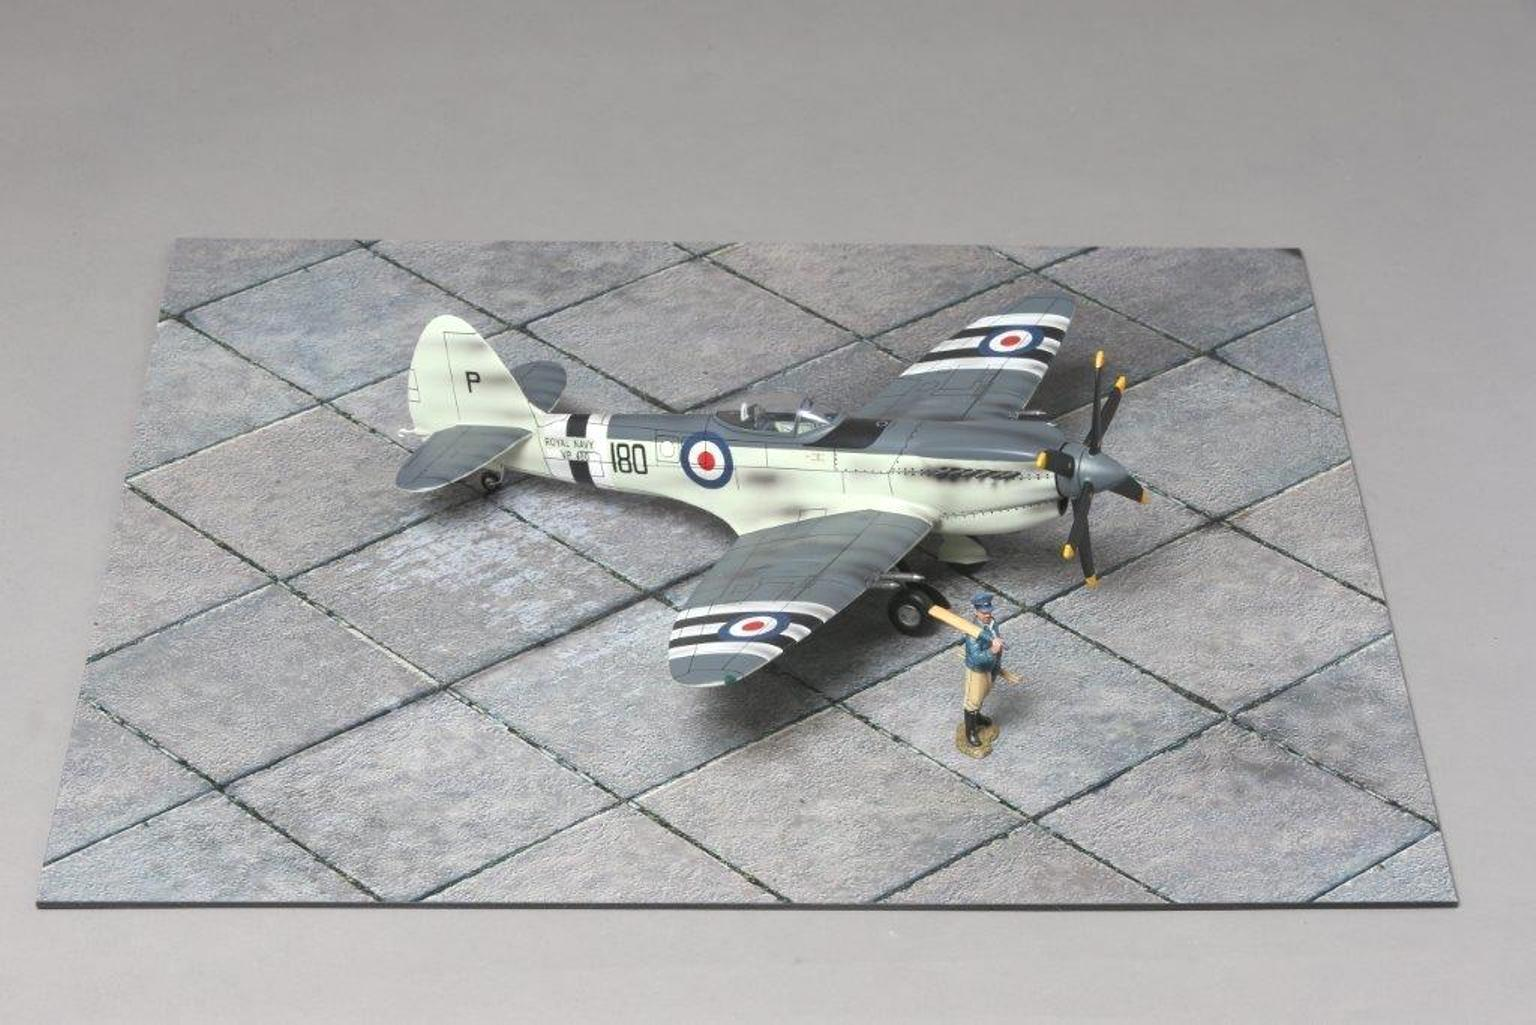 Thomas Gunn Accessori Diorama WW2 MAT004 CeSieto Airfield Tappetino MIB